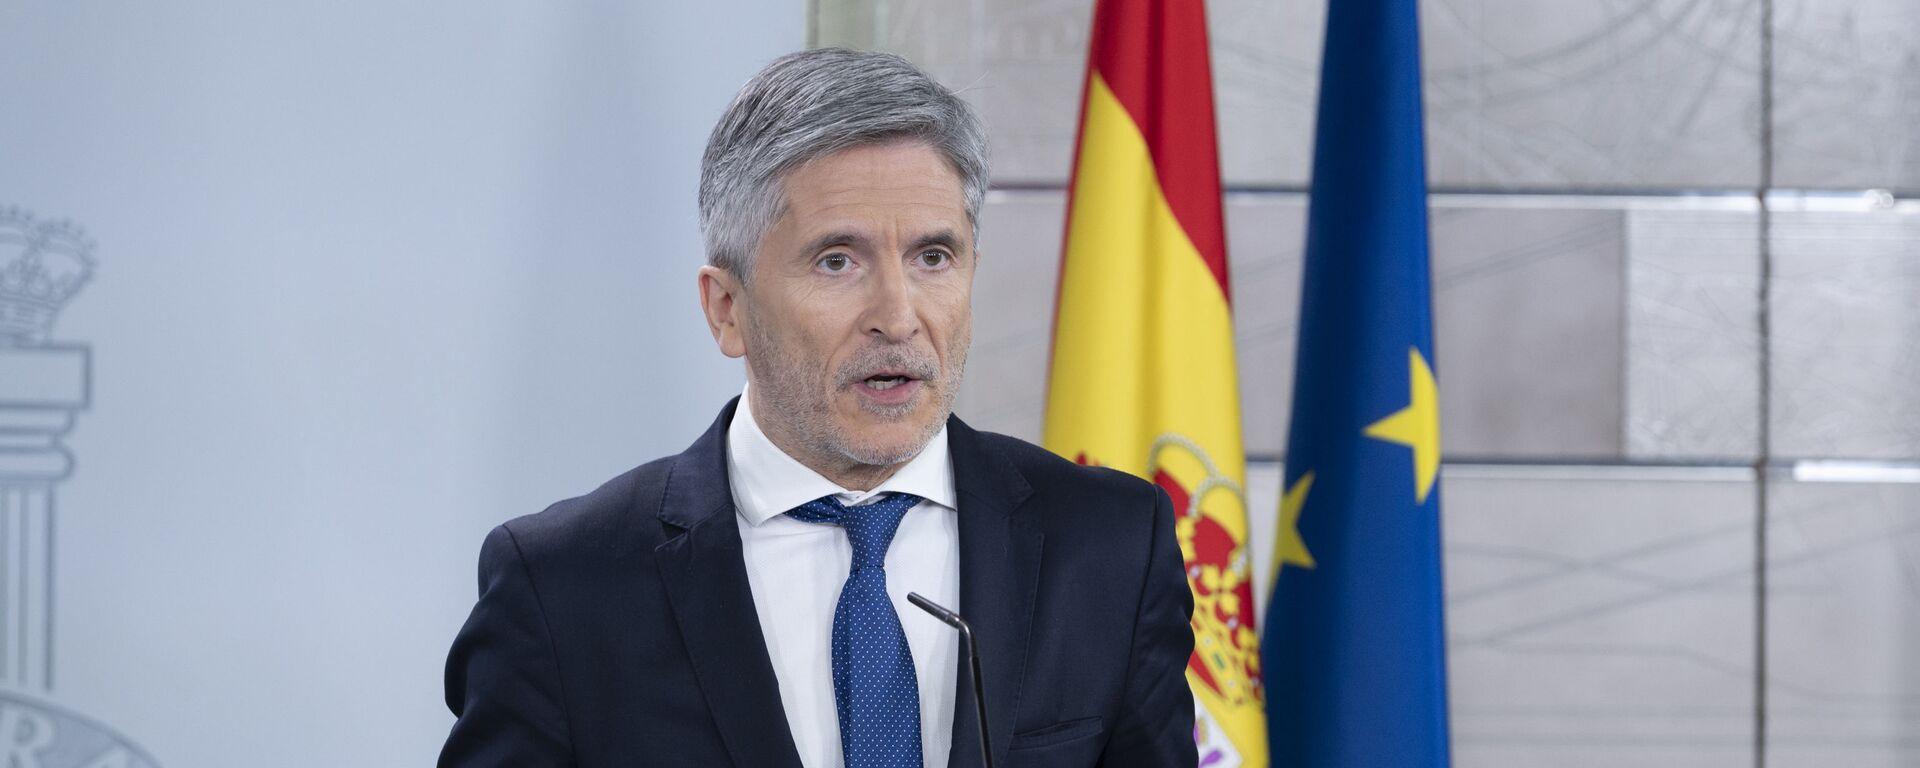 Fernando Grande-Marlaska, ministro de Interior español - Sputnik Mundo, 1920, 12.03.2021